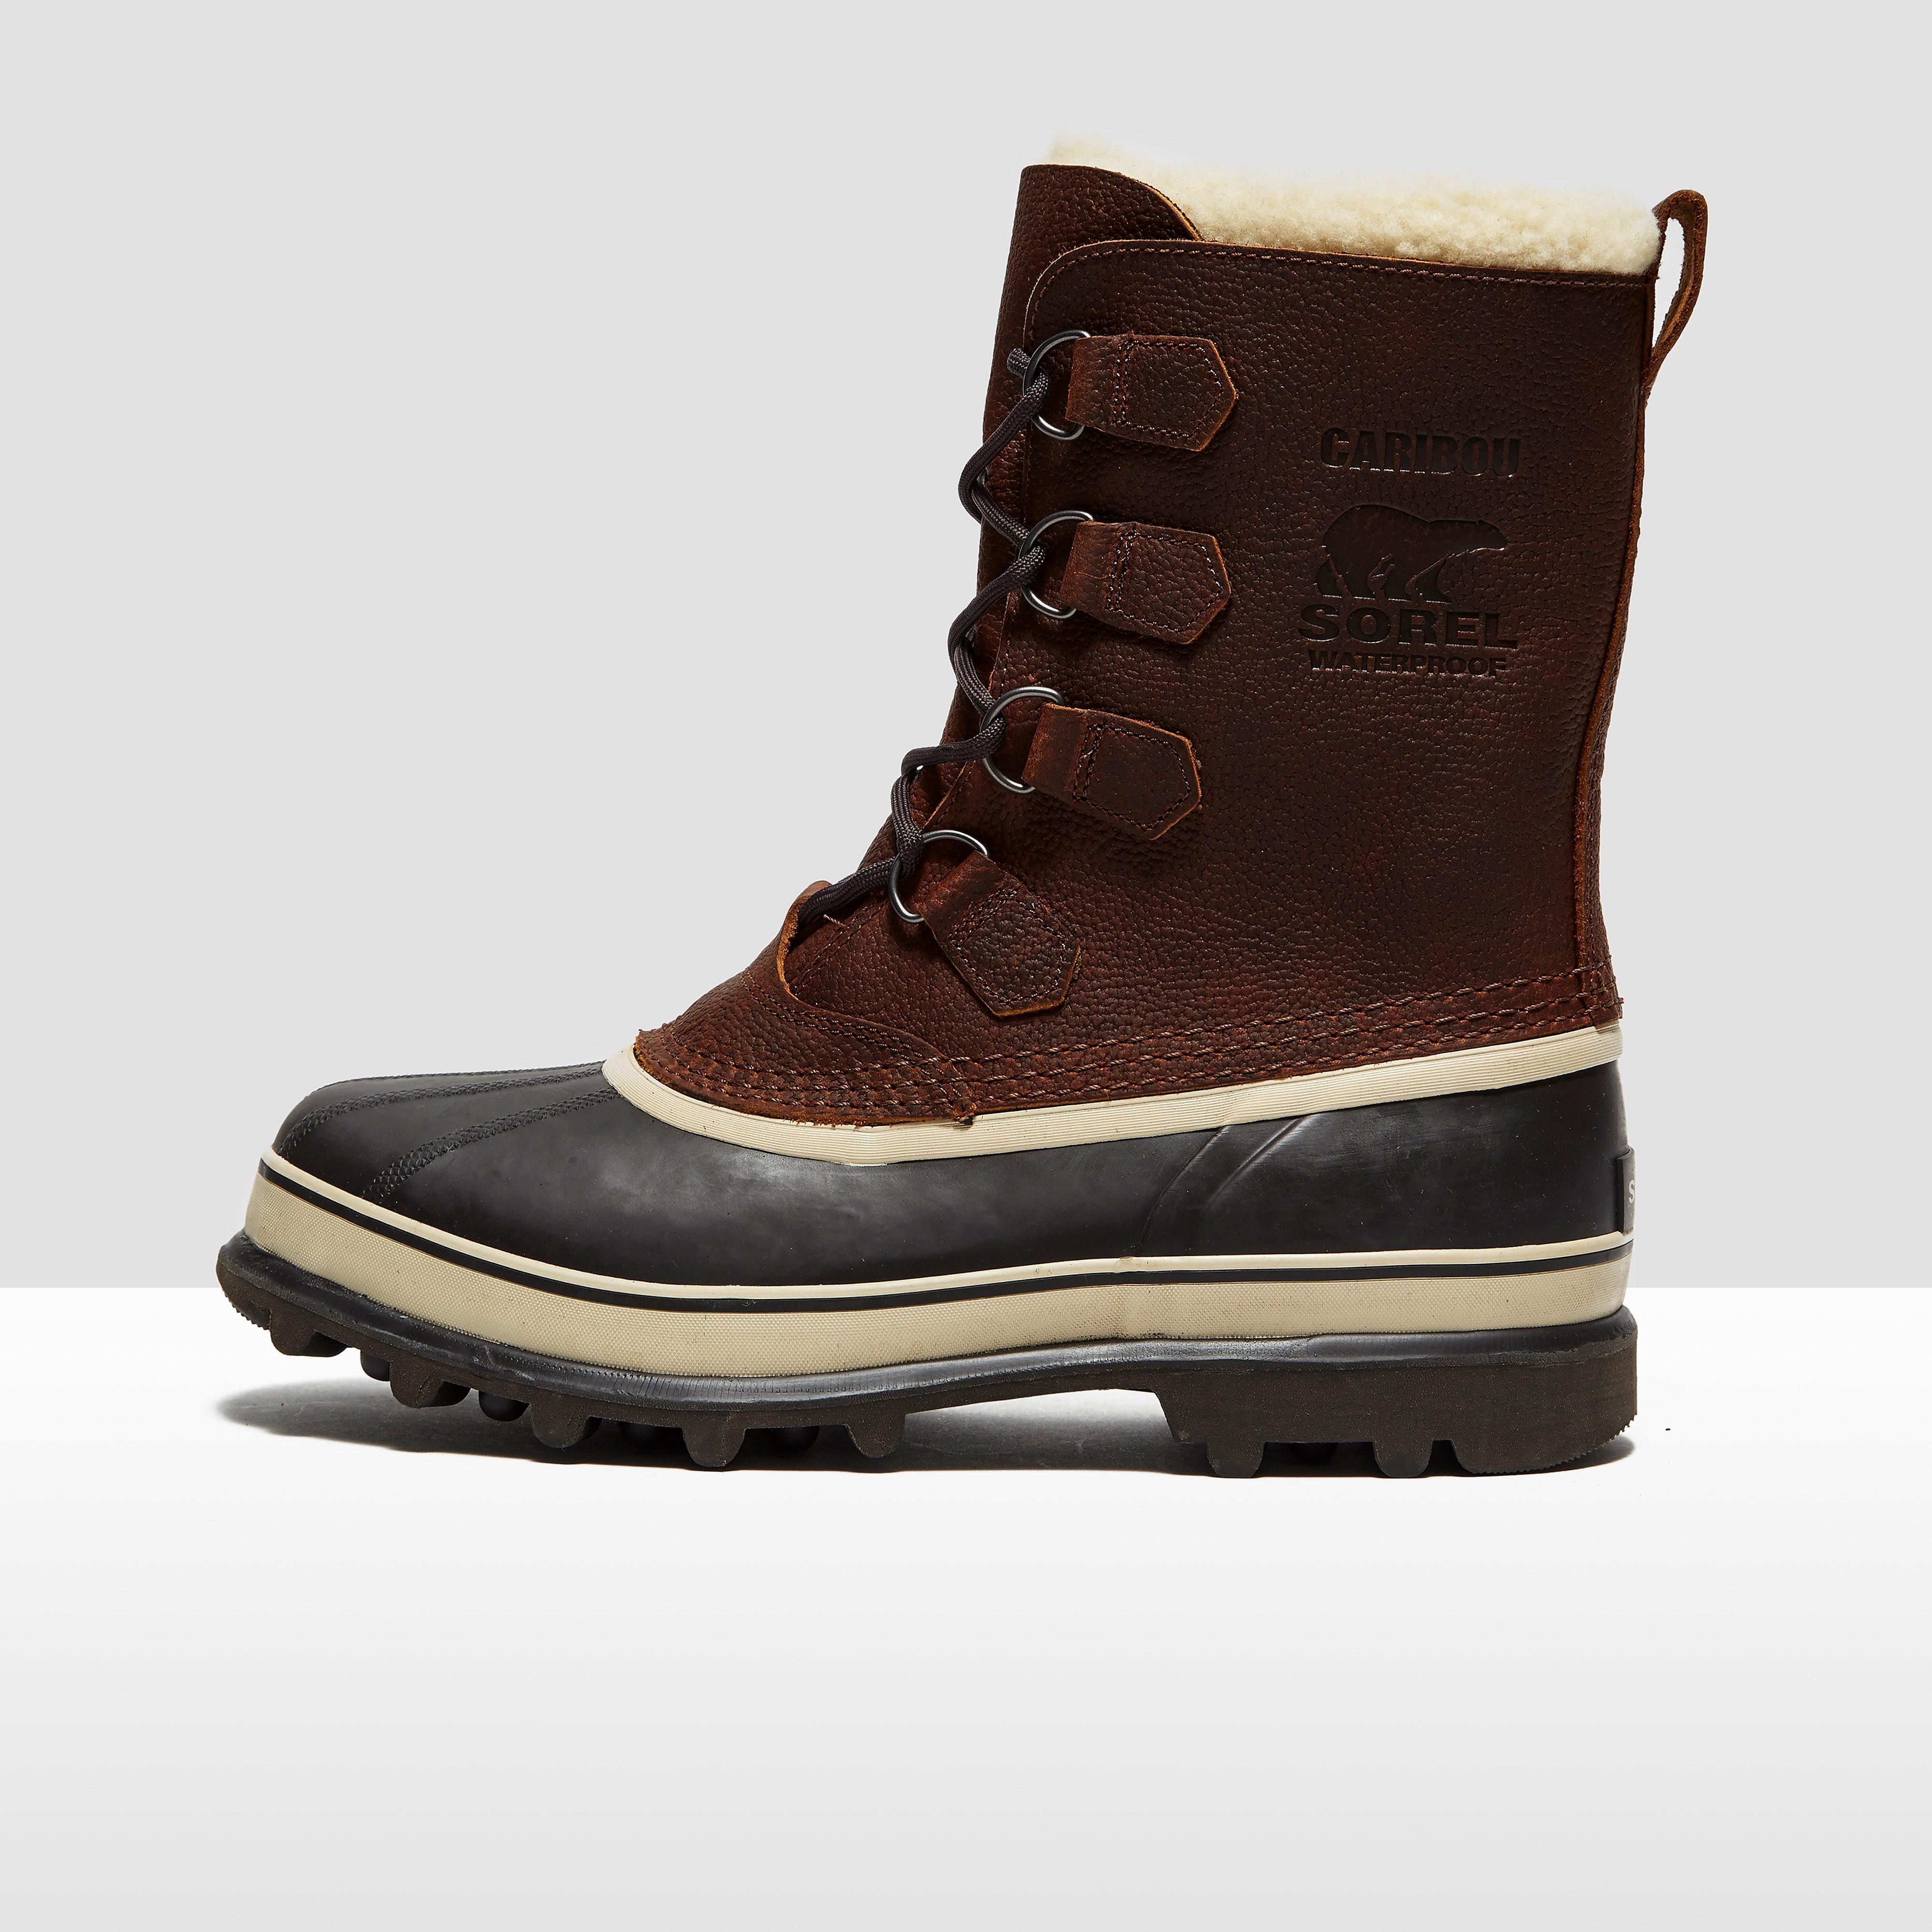 Sorel Men's Caribou Winter Boots